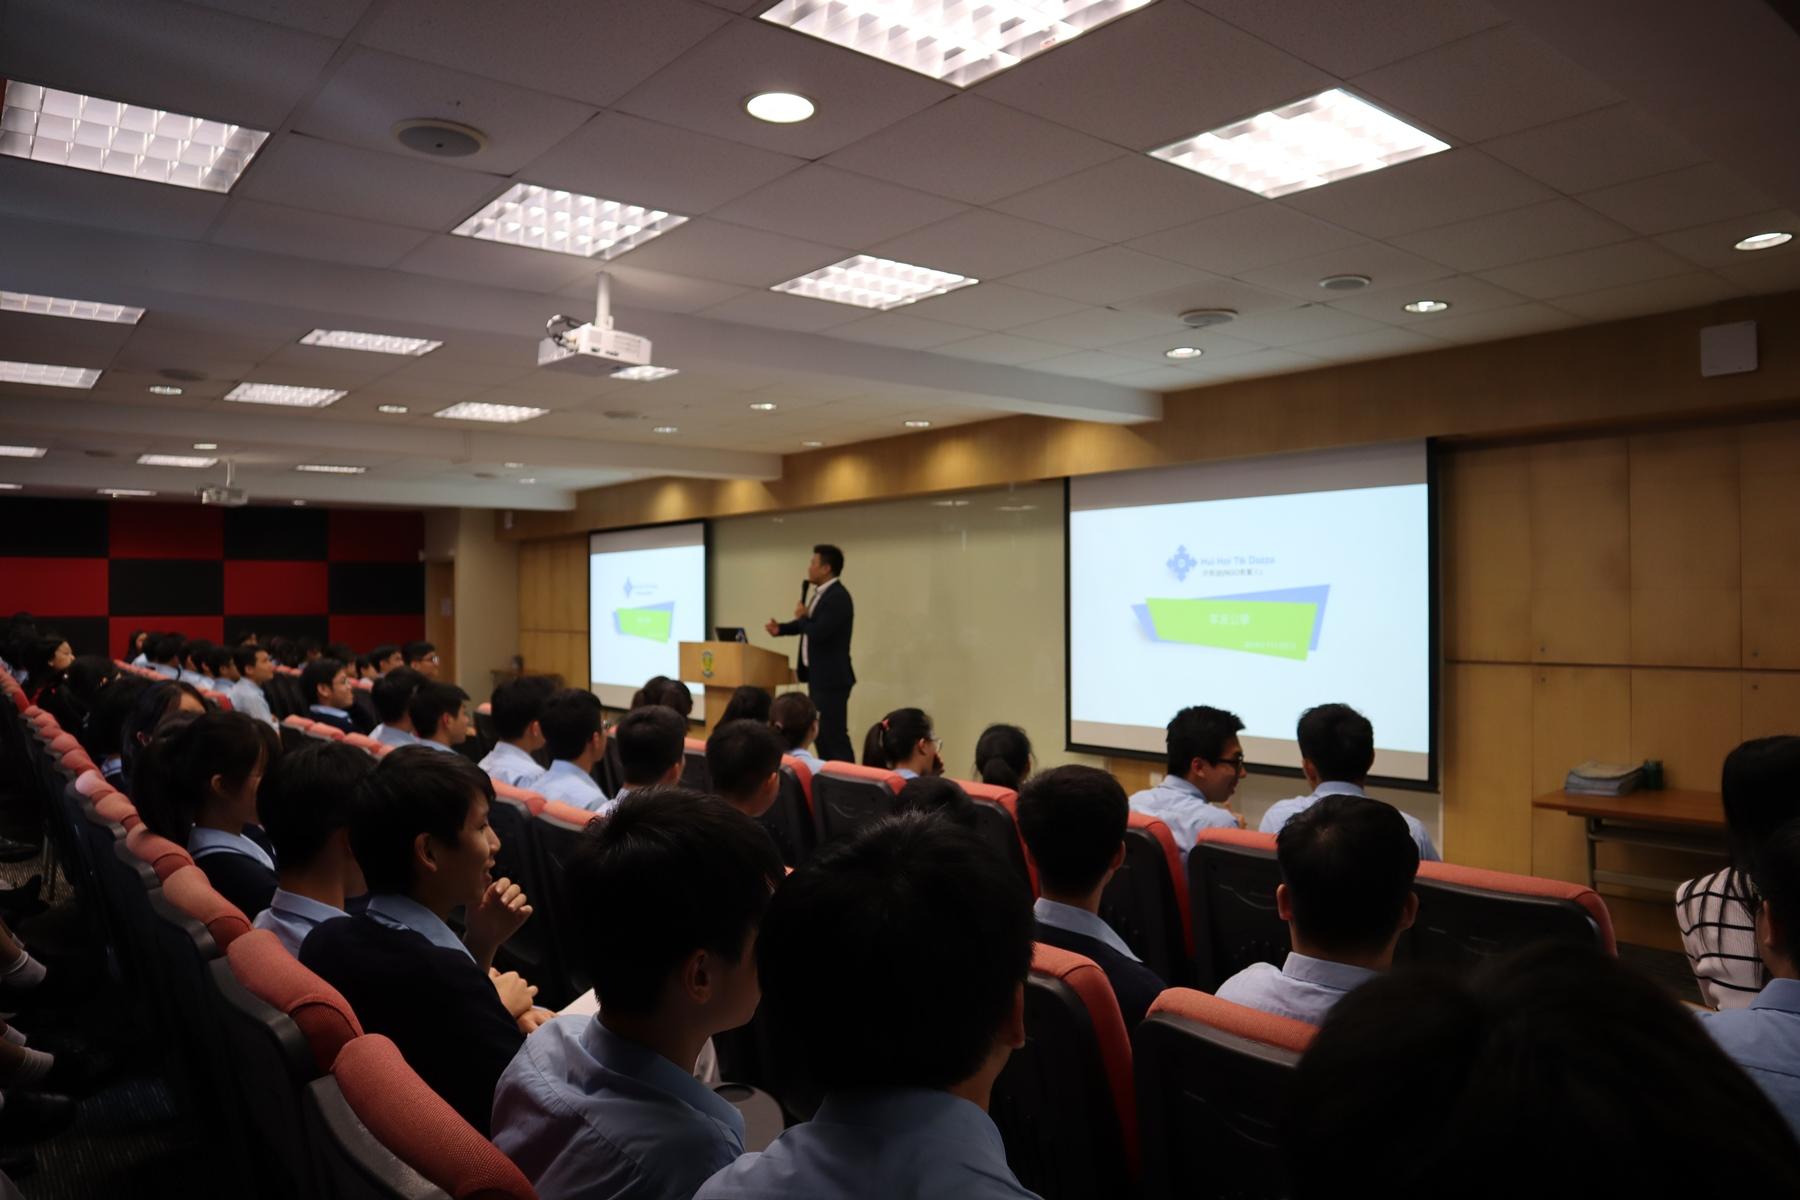 http://npc.edu.hk/sites/default/files/img_0082.jpg